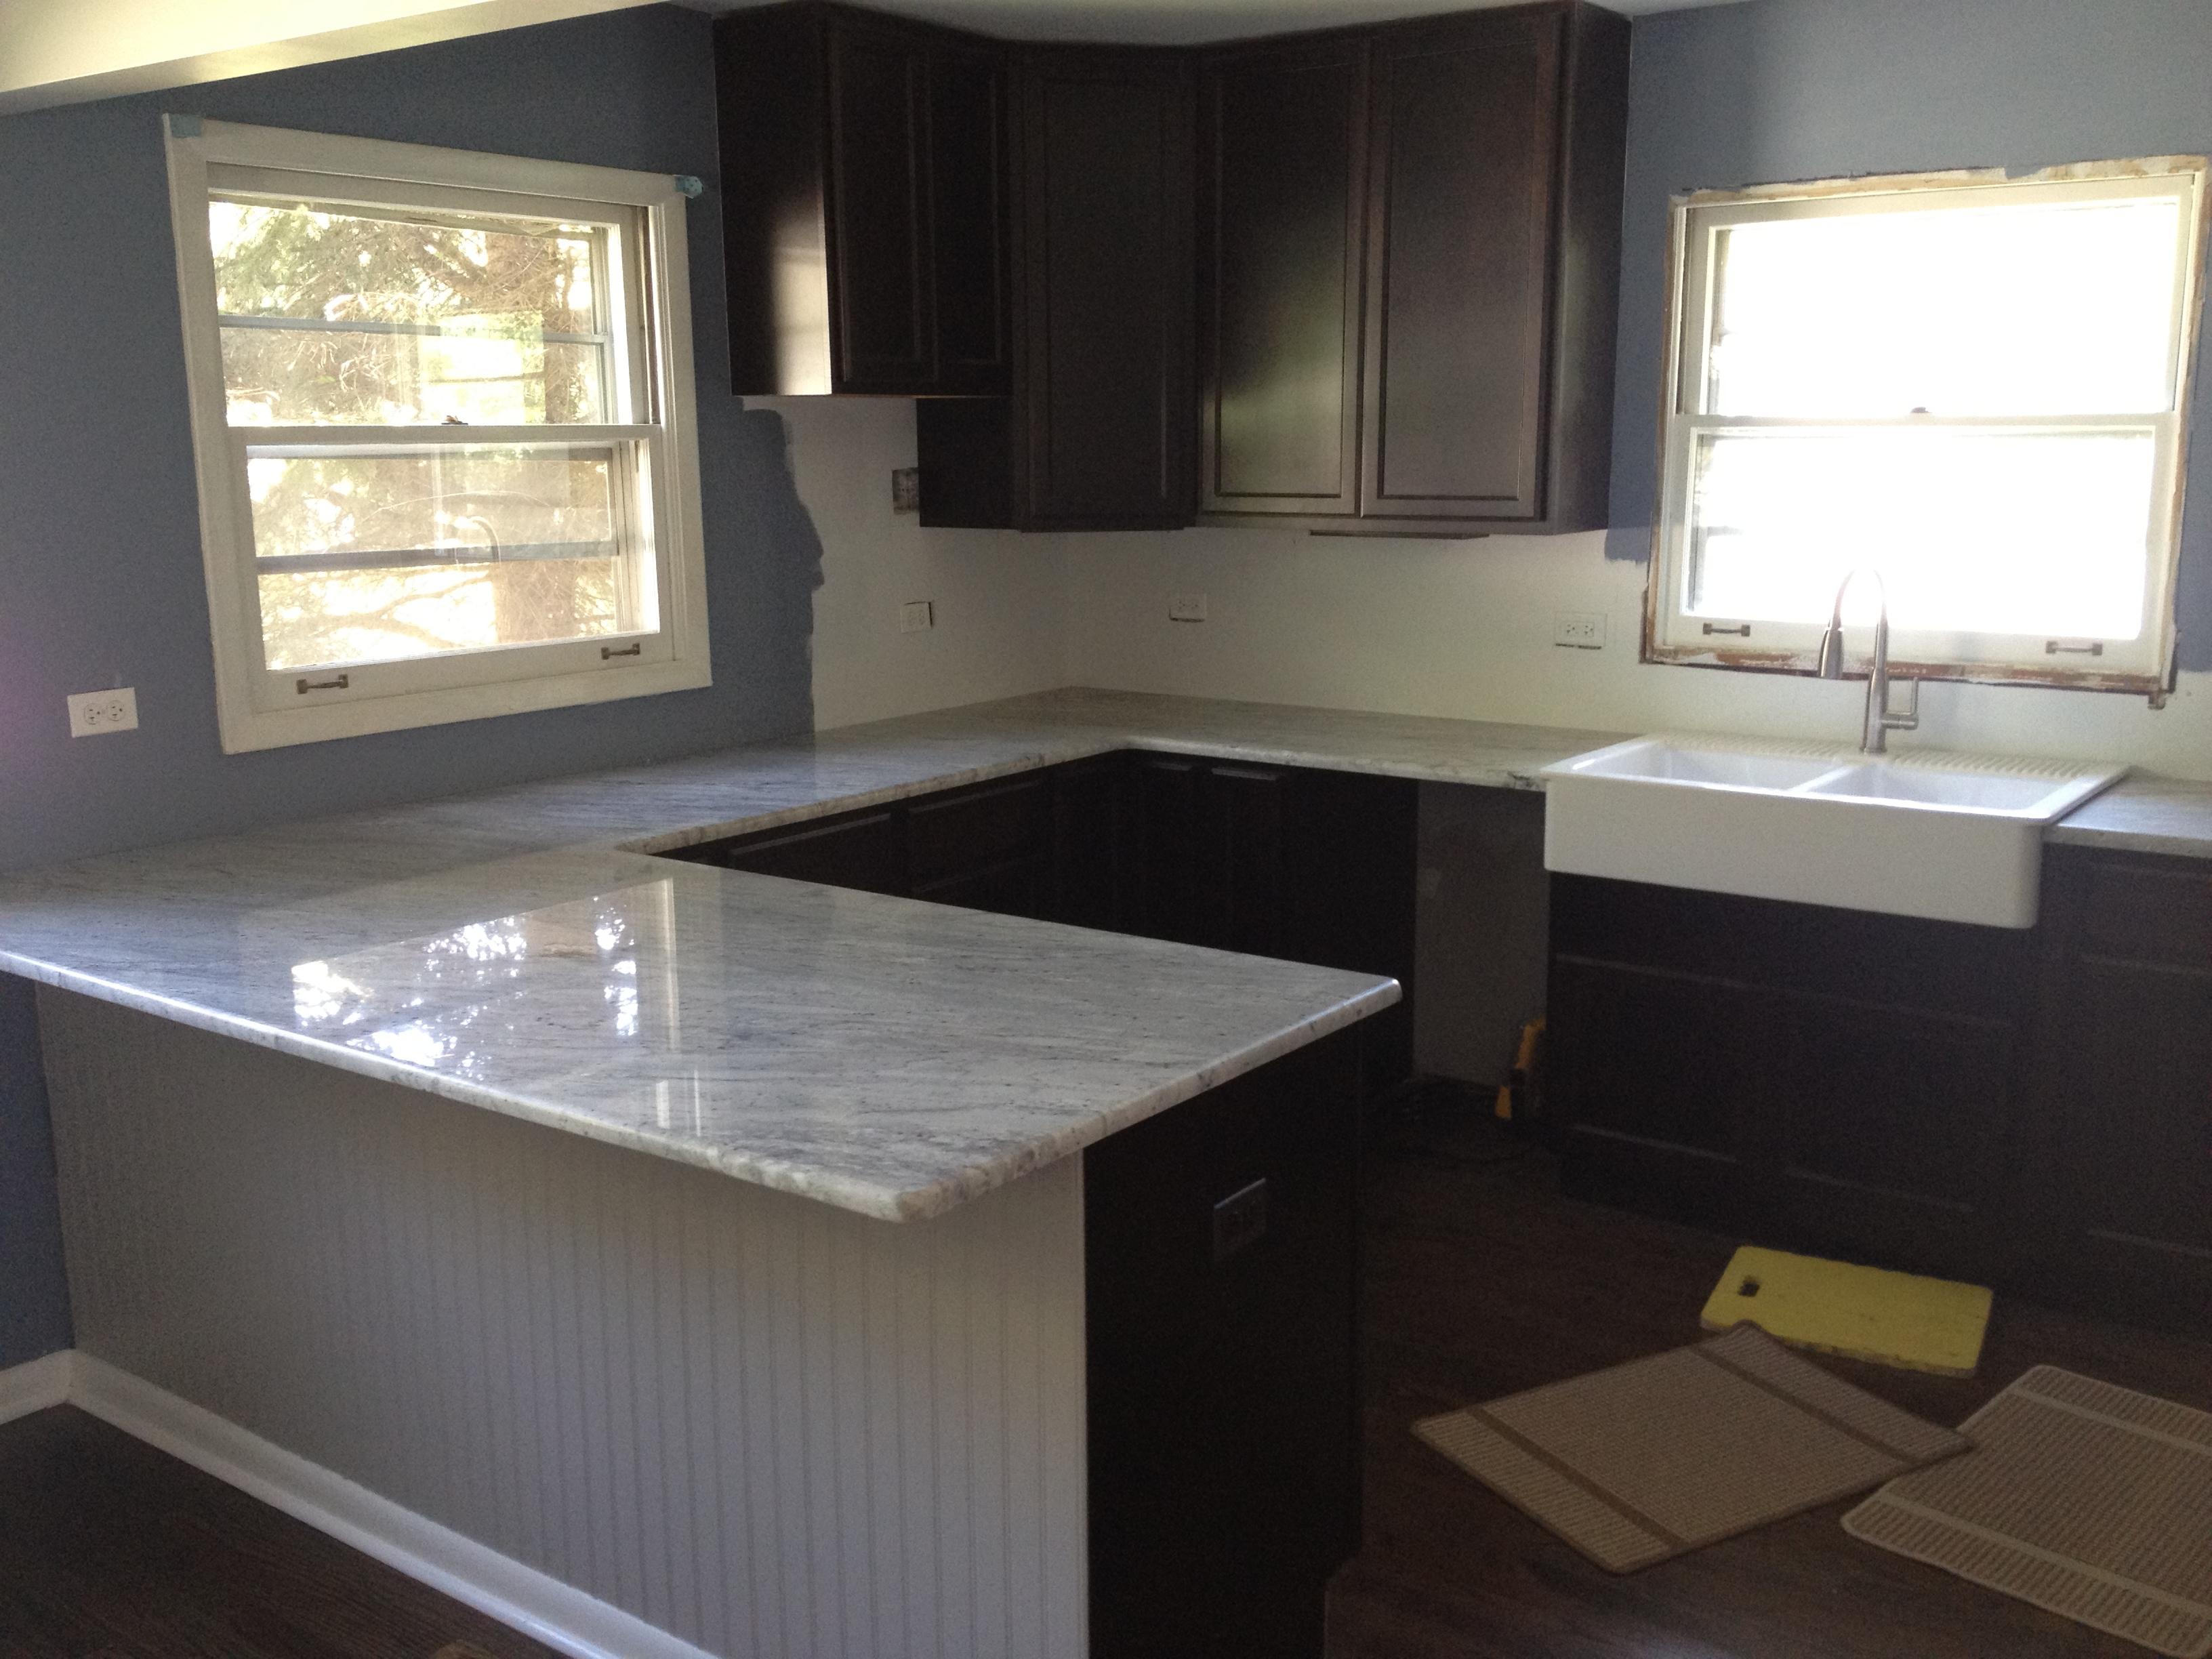 white kitchen cabinets grey granite countertops kitchen cabinets and countertops Granite Countertops